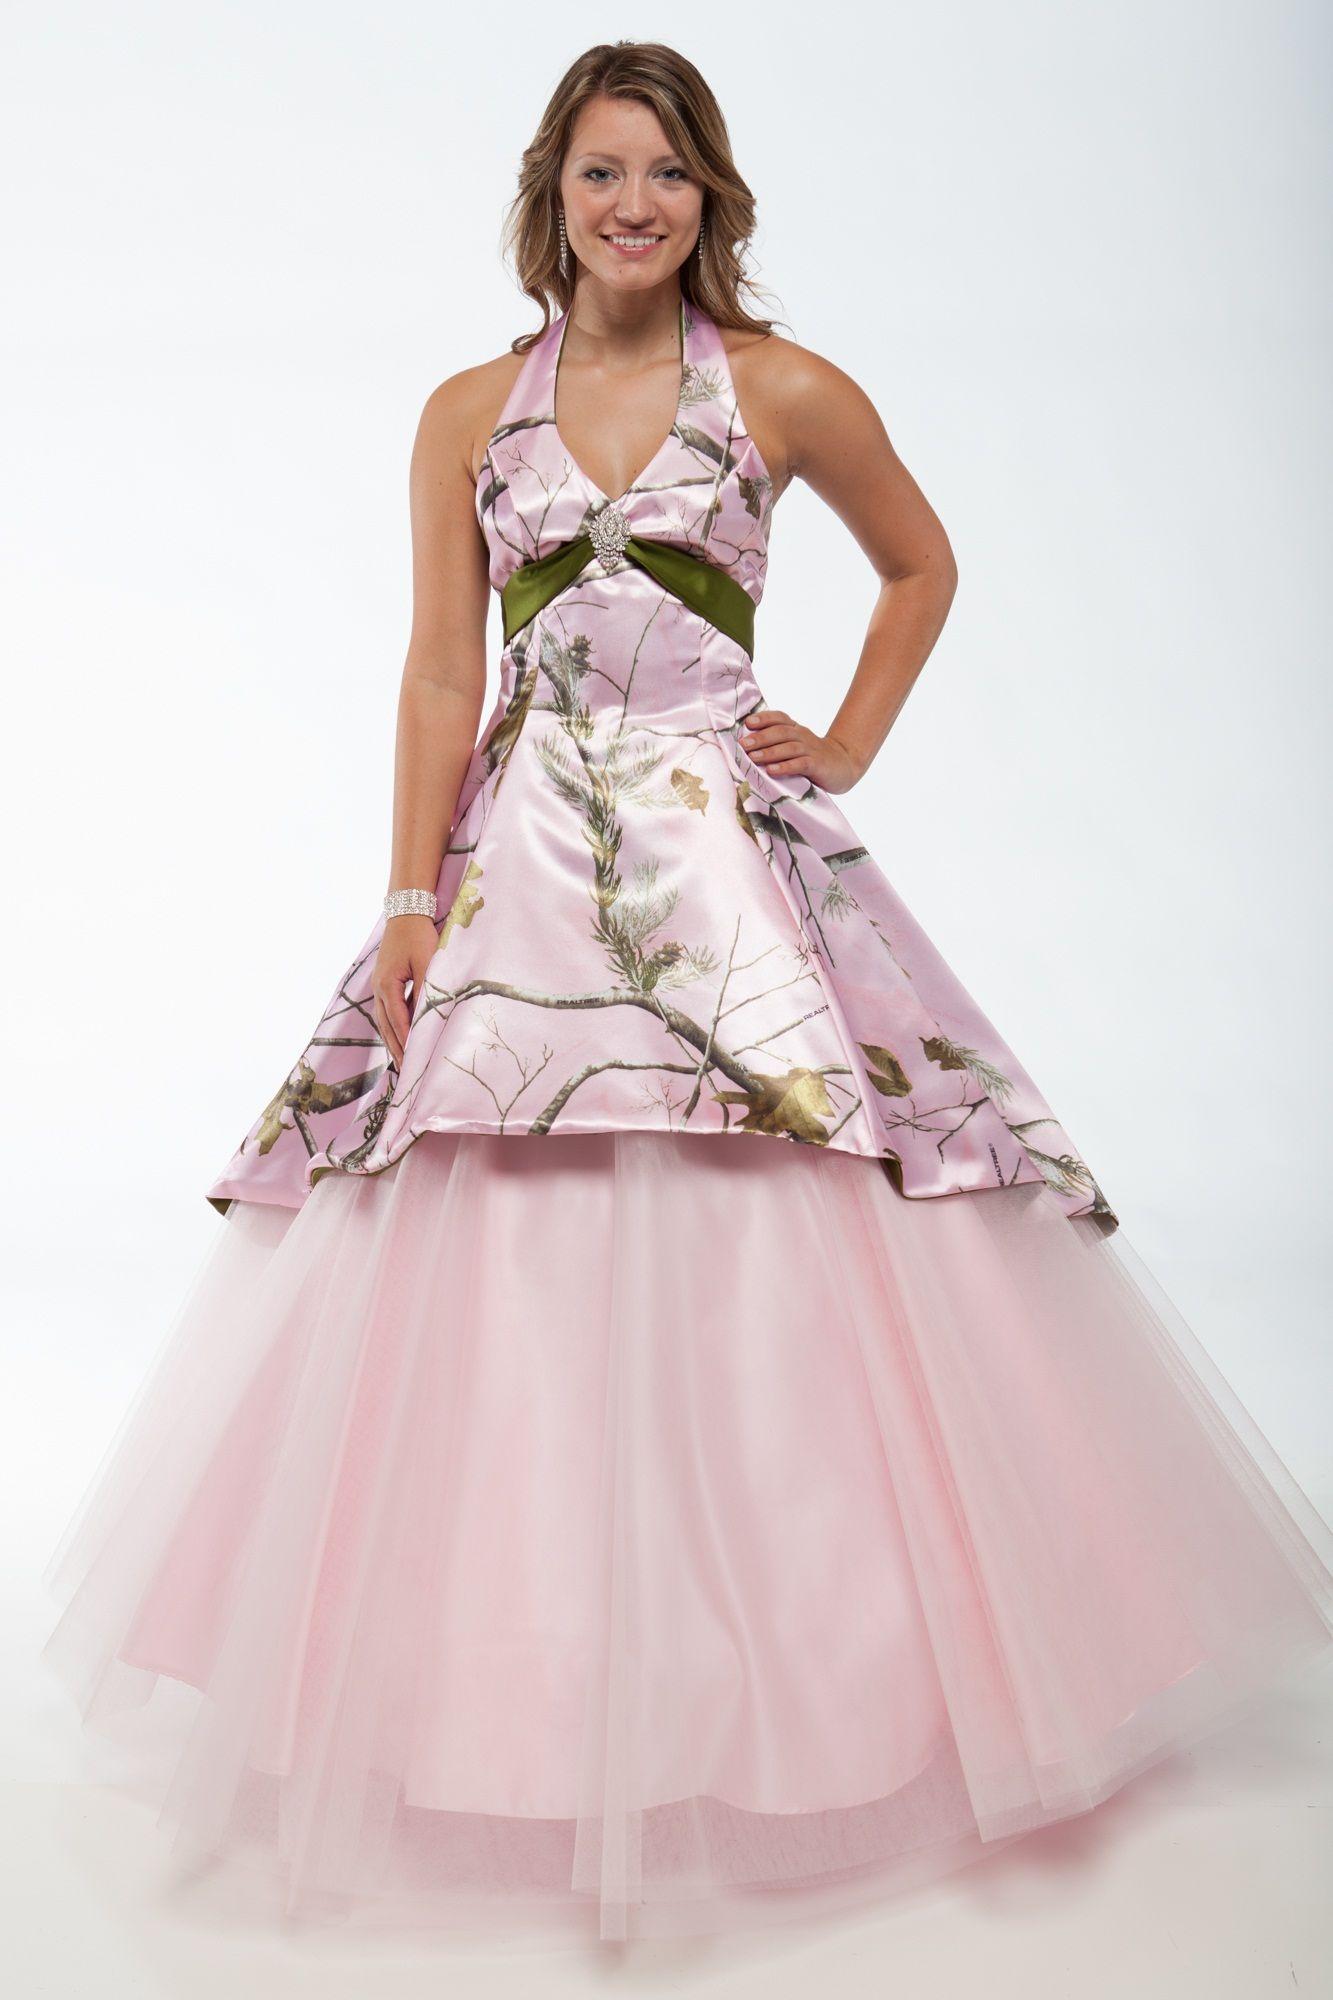 8d257d9d432c0 20 Camo Wedding Dresses Ideas You Must Love   dresses   Pink camo ...